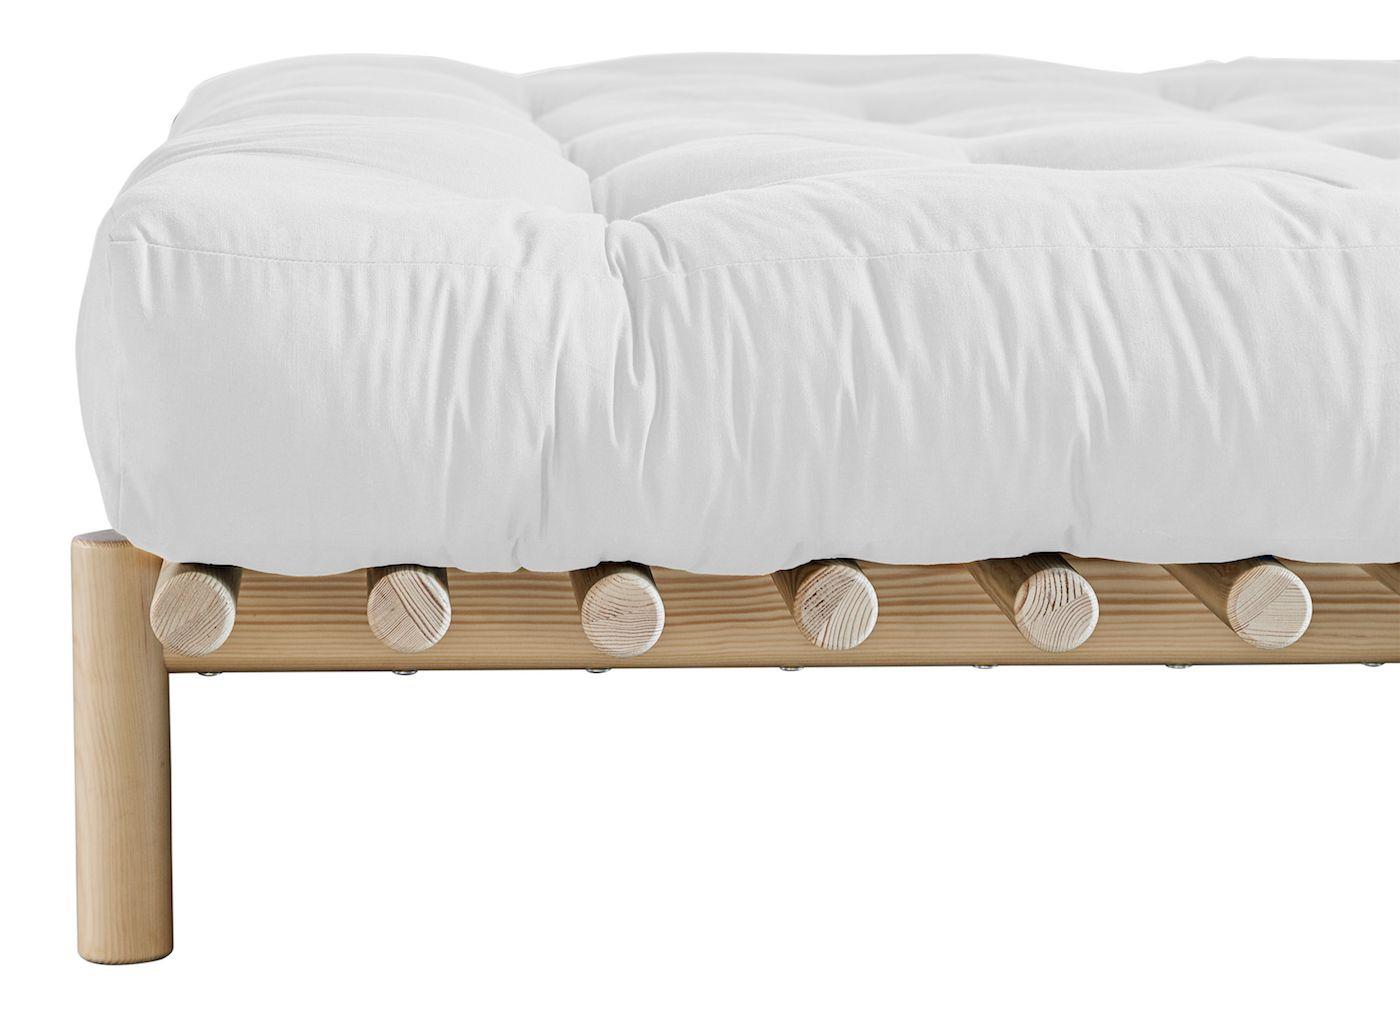 Coco madras 140x200, Natur - Futon madrass i hvit